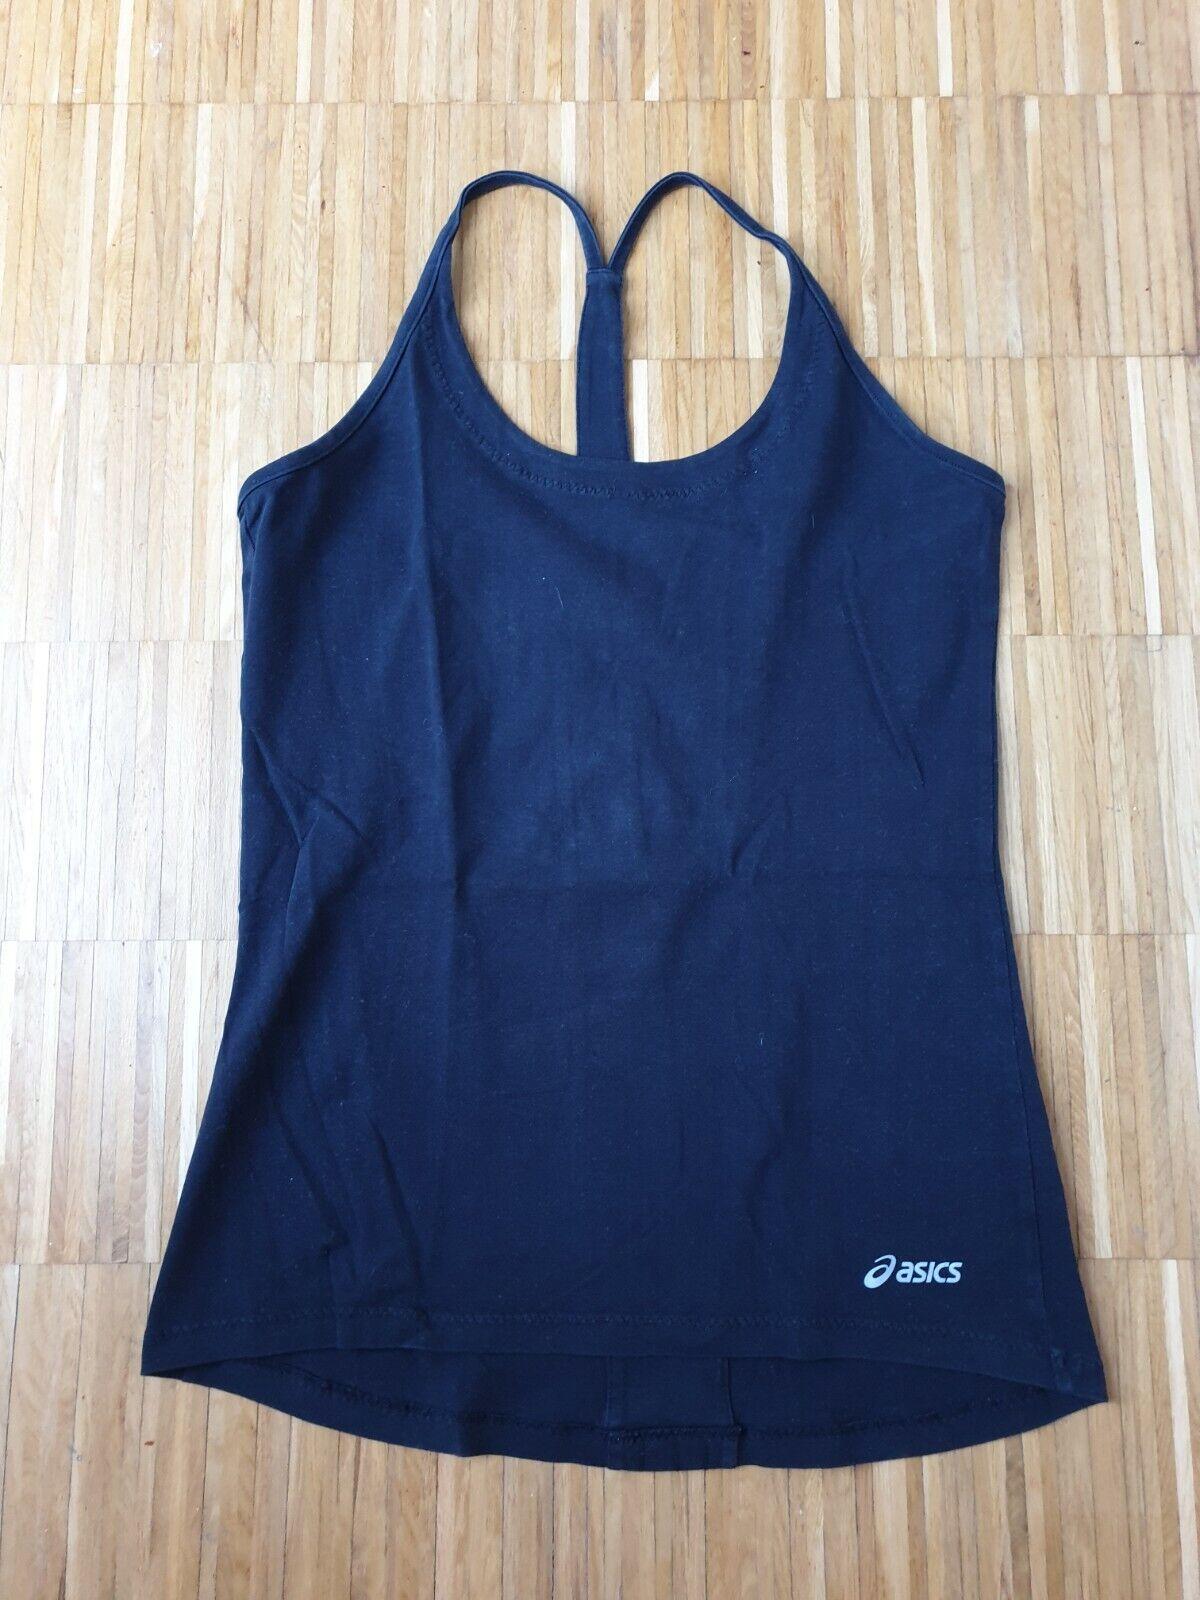 Asics Damen Top Schwarz Logo Träger Sport Laufen Running Fitness Yoga Gr. L